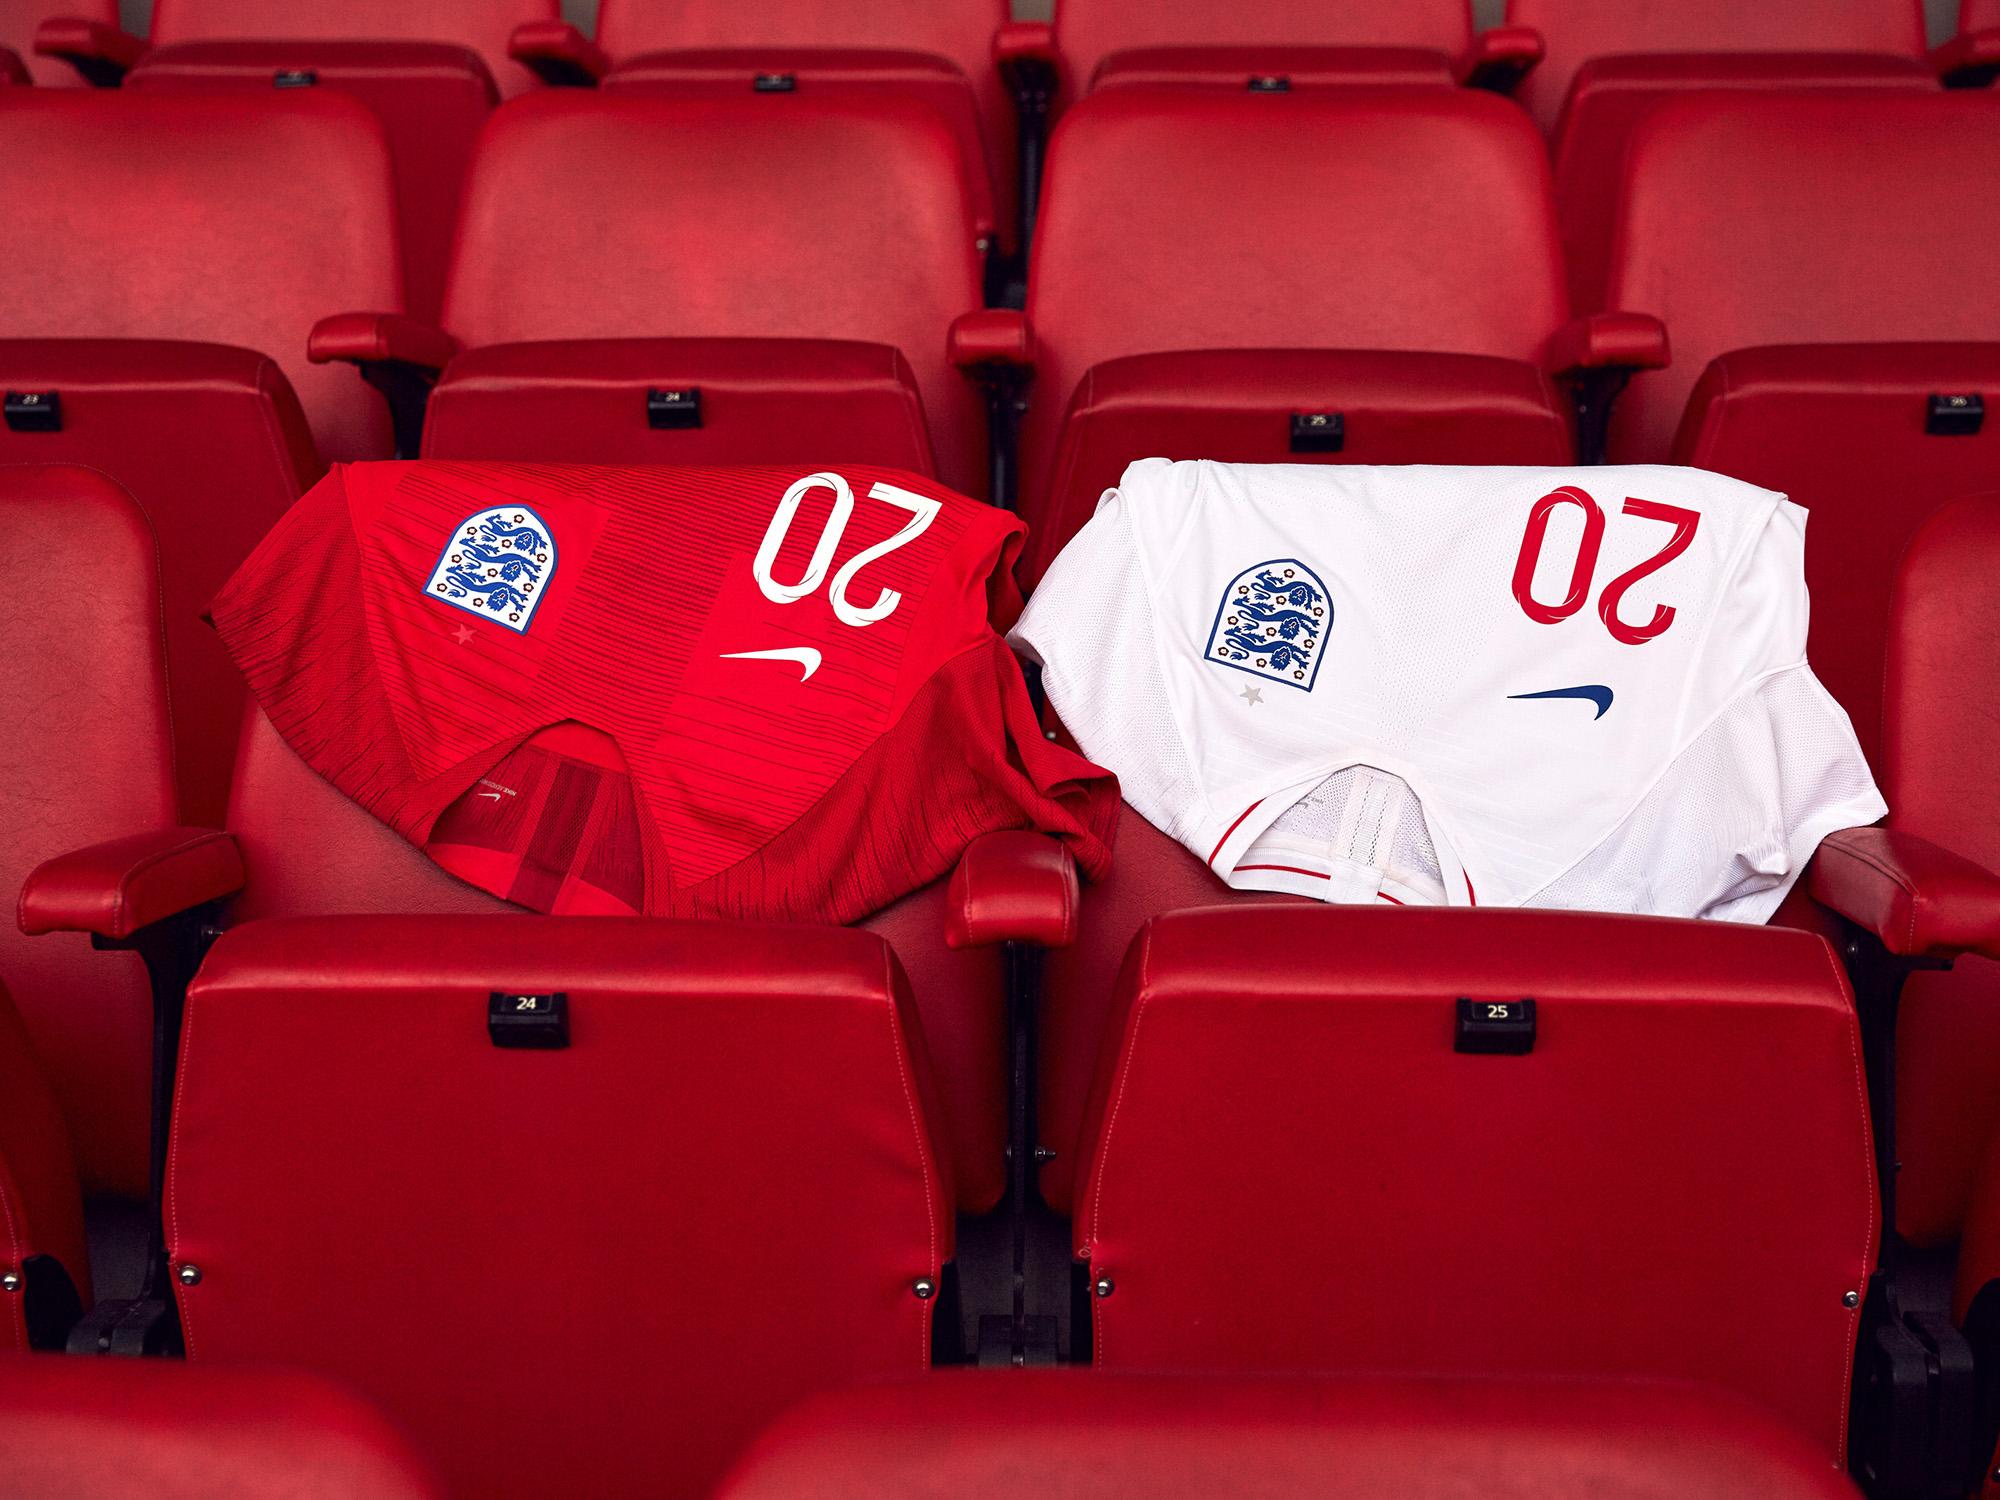 Nike-News-Football-Soccer-England-National-Team-Kit-7_77387